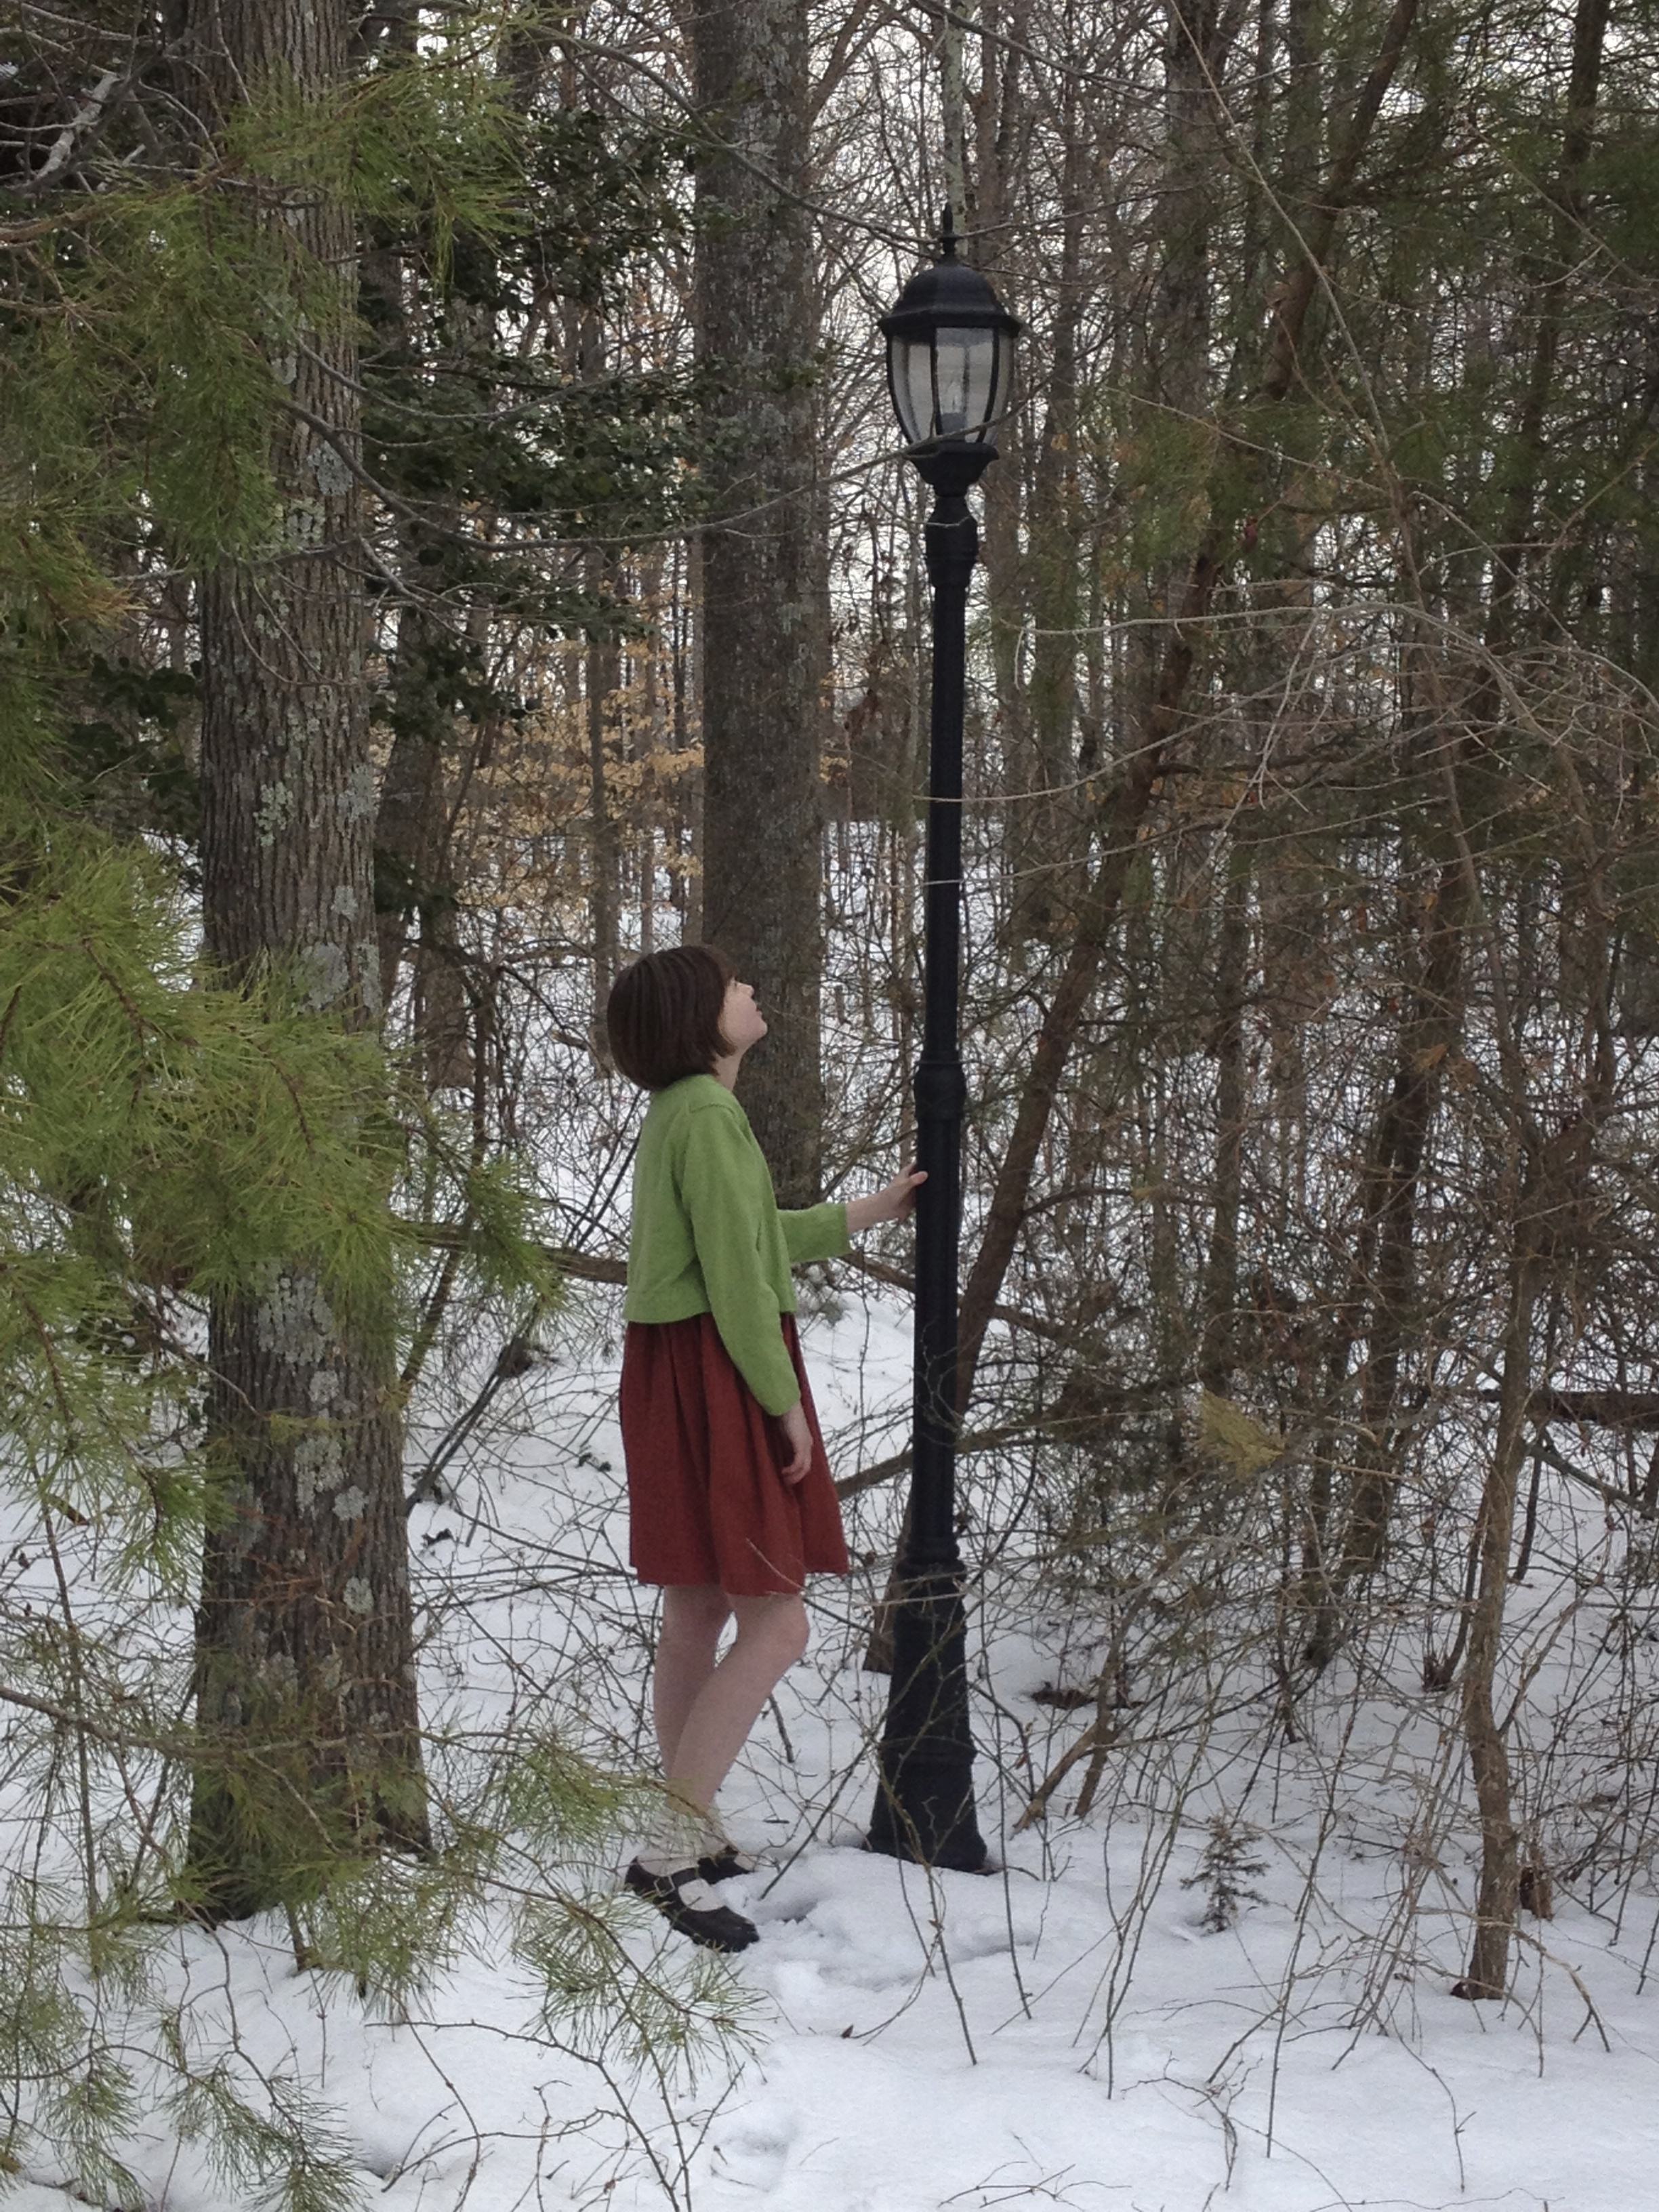 Lamppost, LWW Narnia vs2